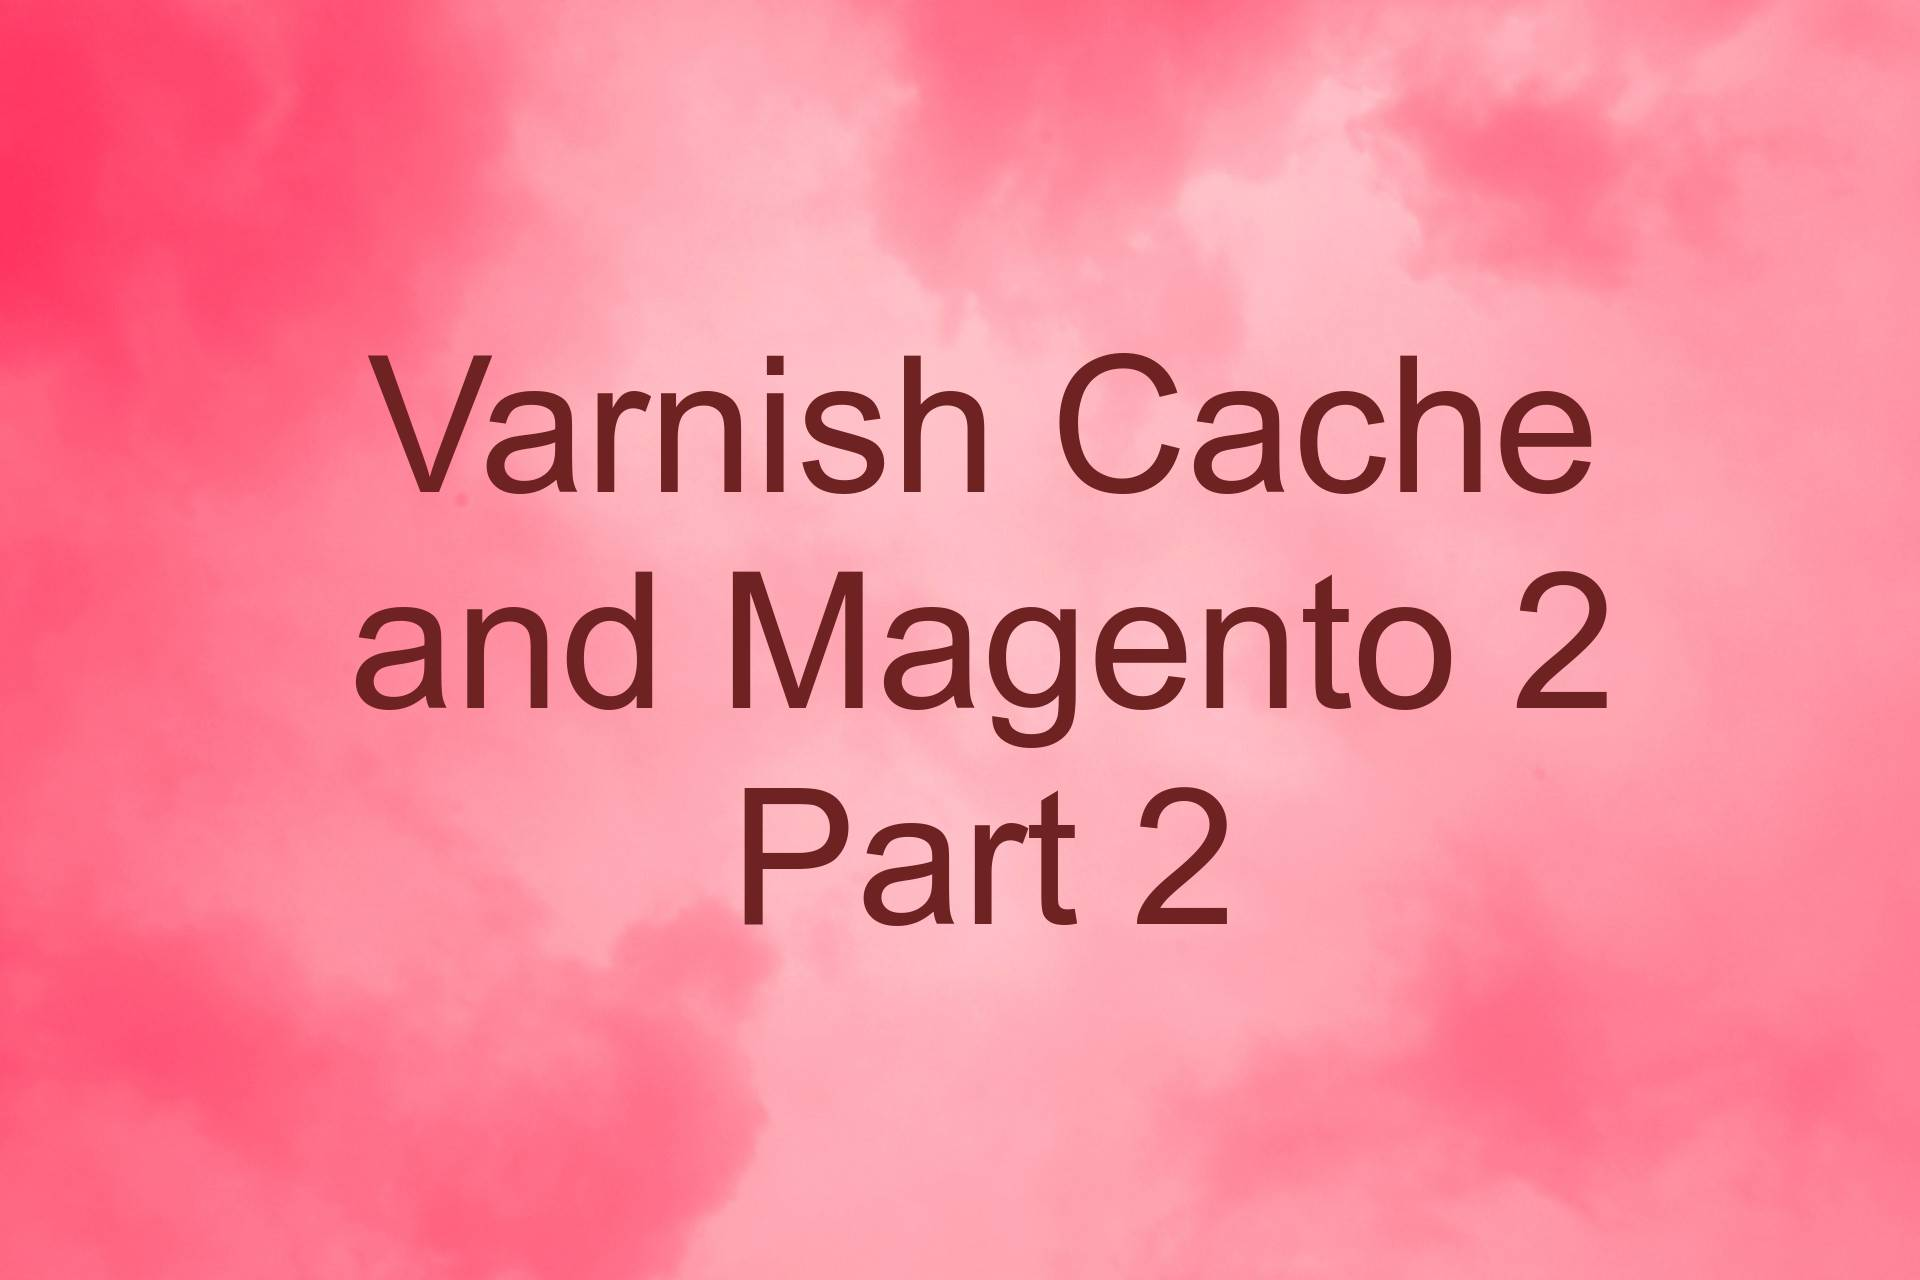 VARNISH CACHE AND MAGENTO 2